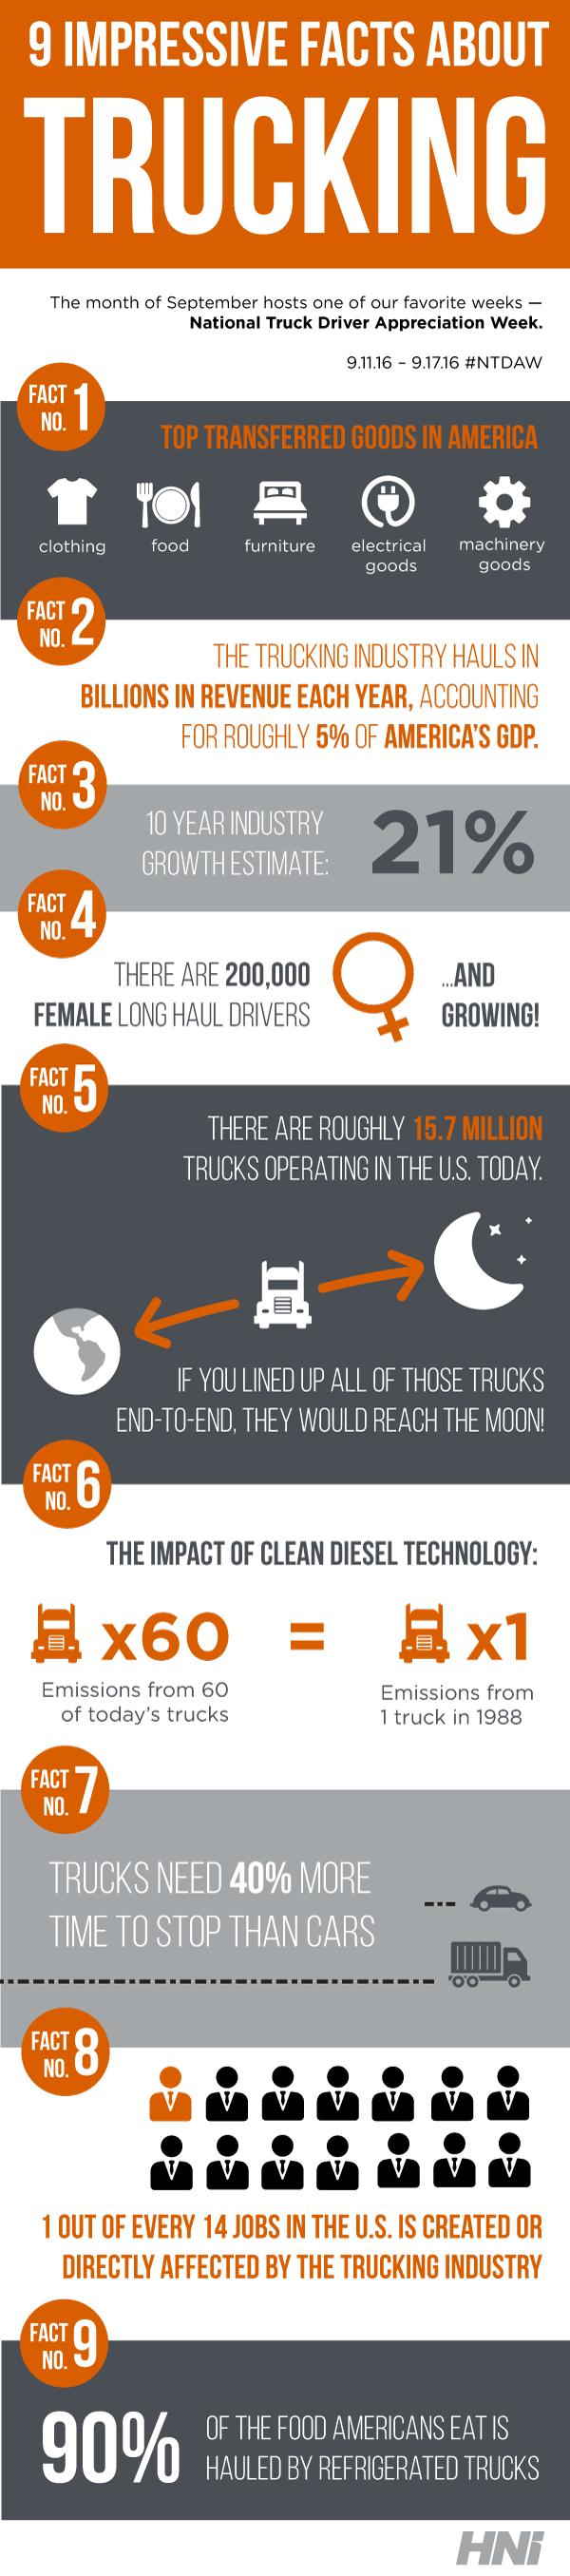 HNI-NTDAW-Infographic-Blog-1.png